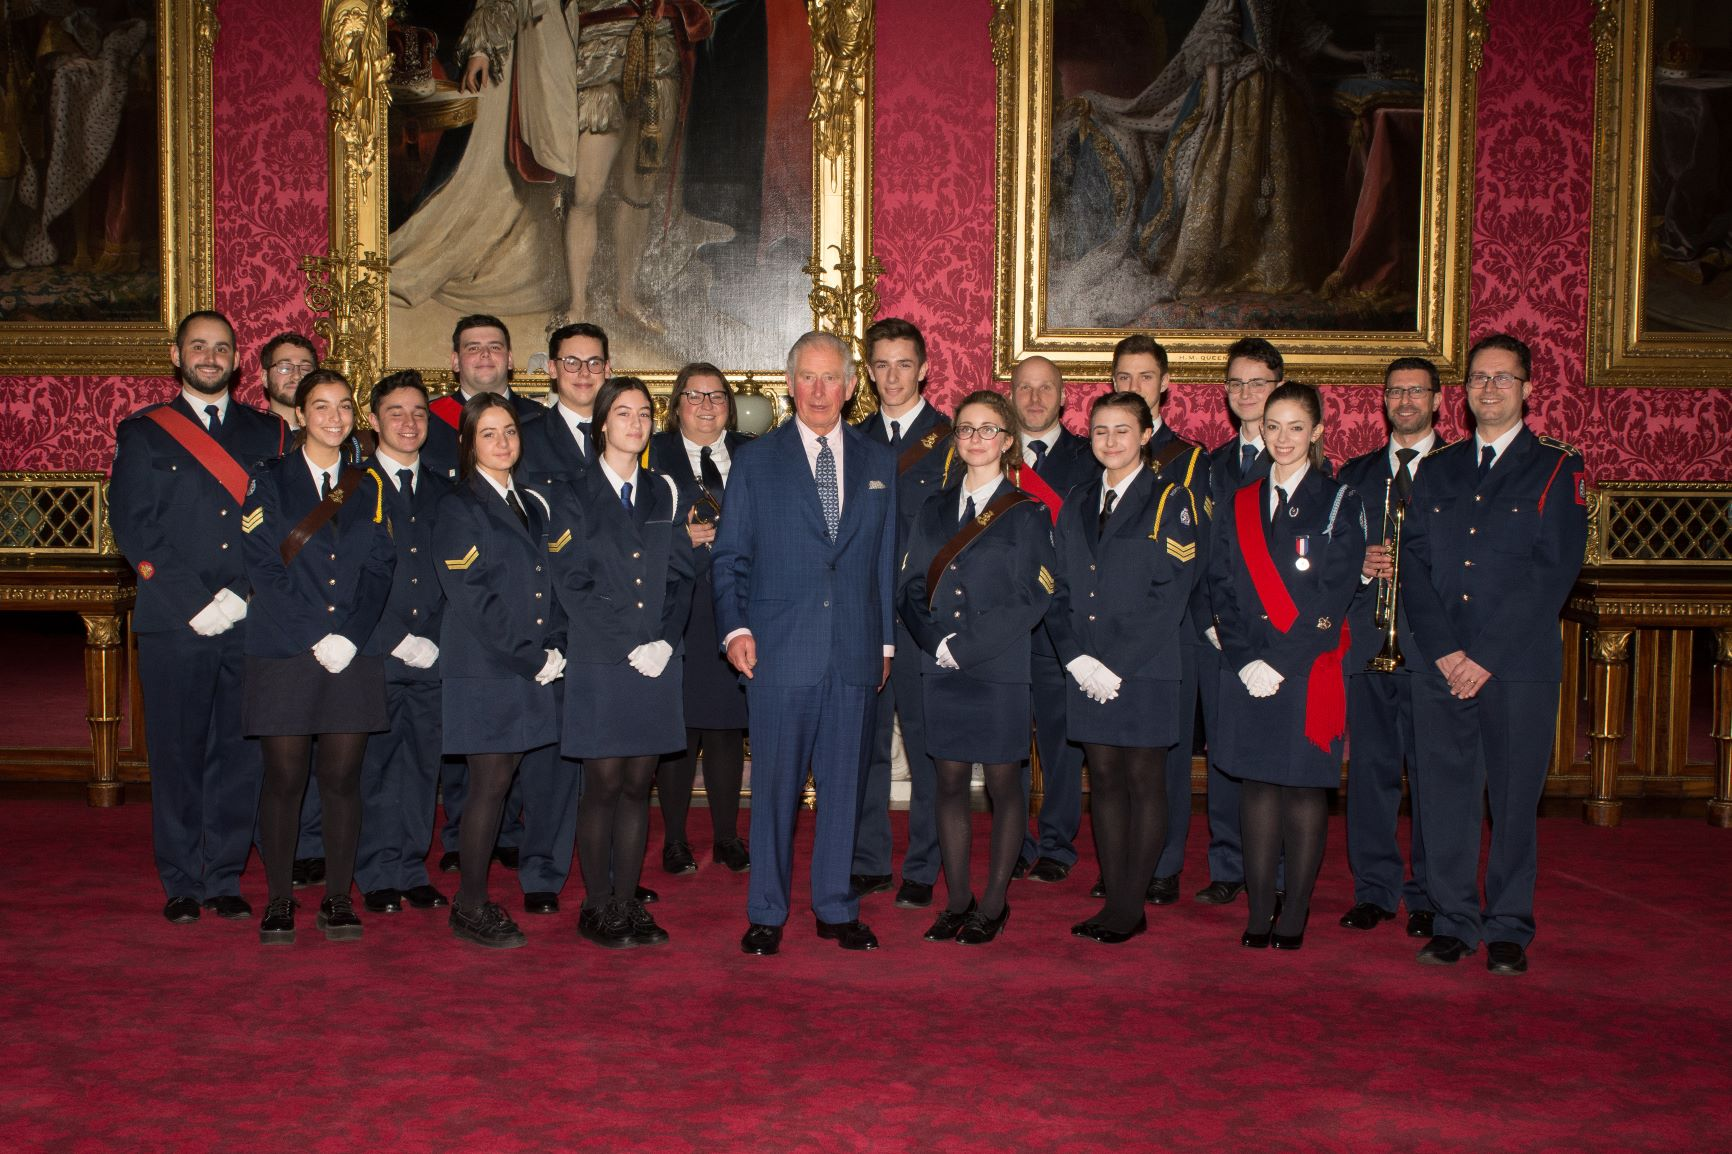 The Prince of Wales with JLGB members (Credit: Board of Deputies of British Jews)